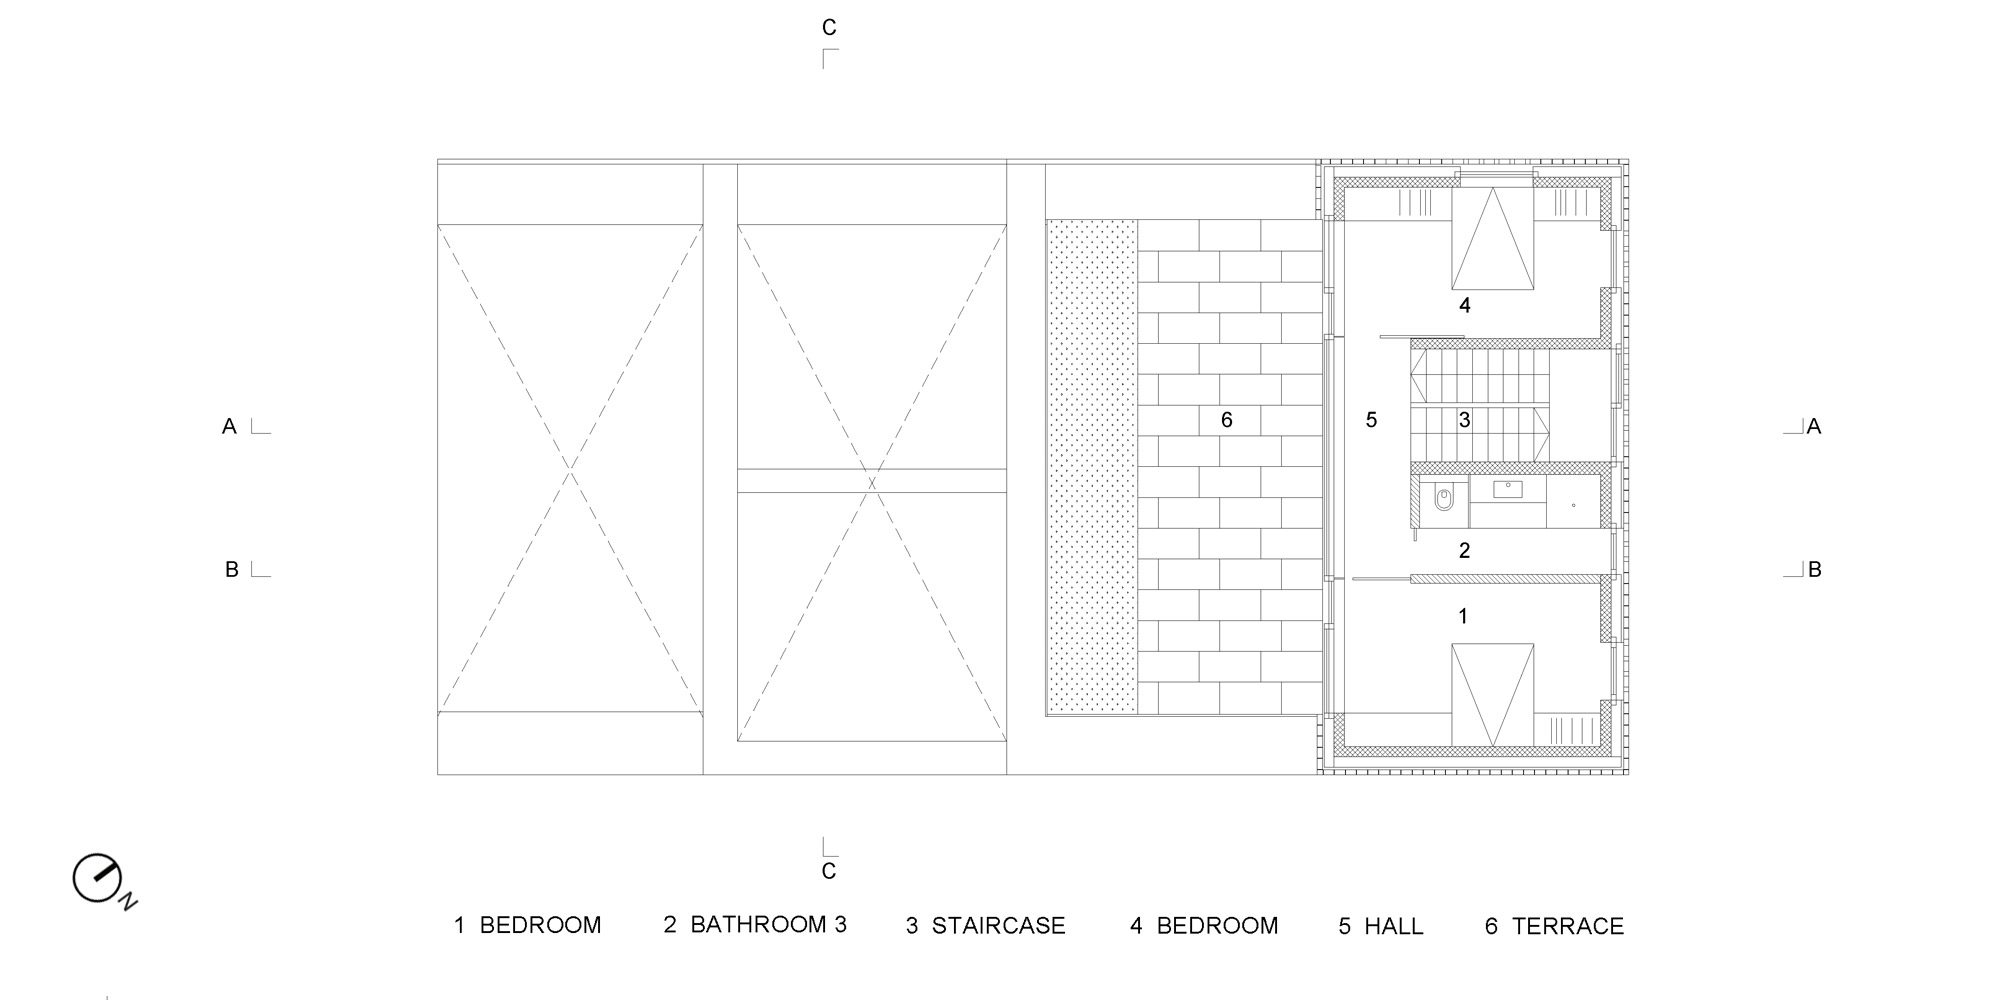 Second floor plan © OFIS architekti